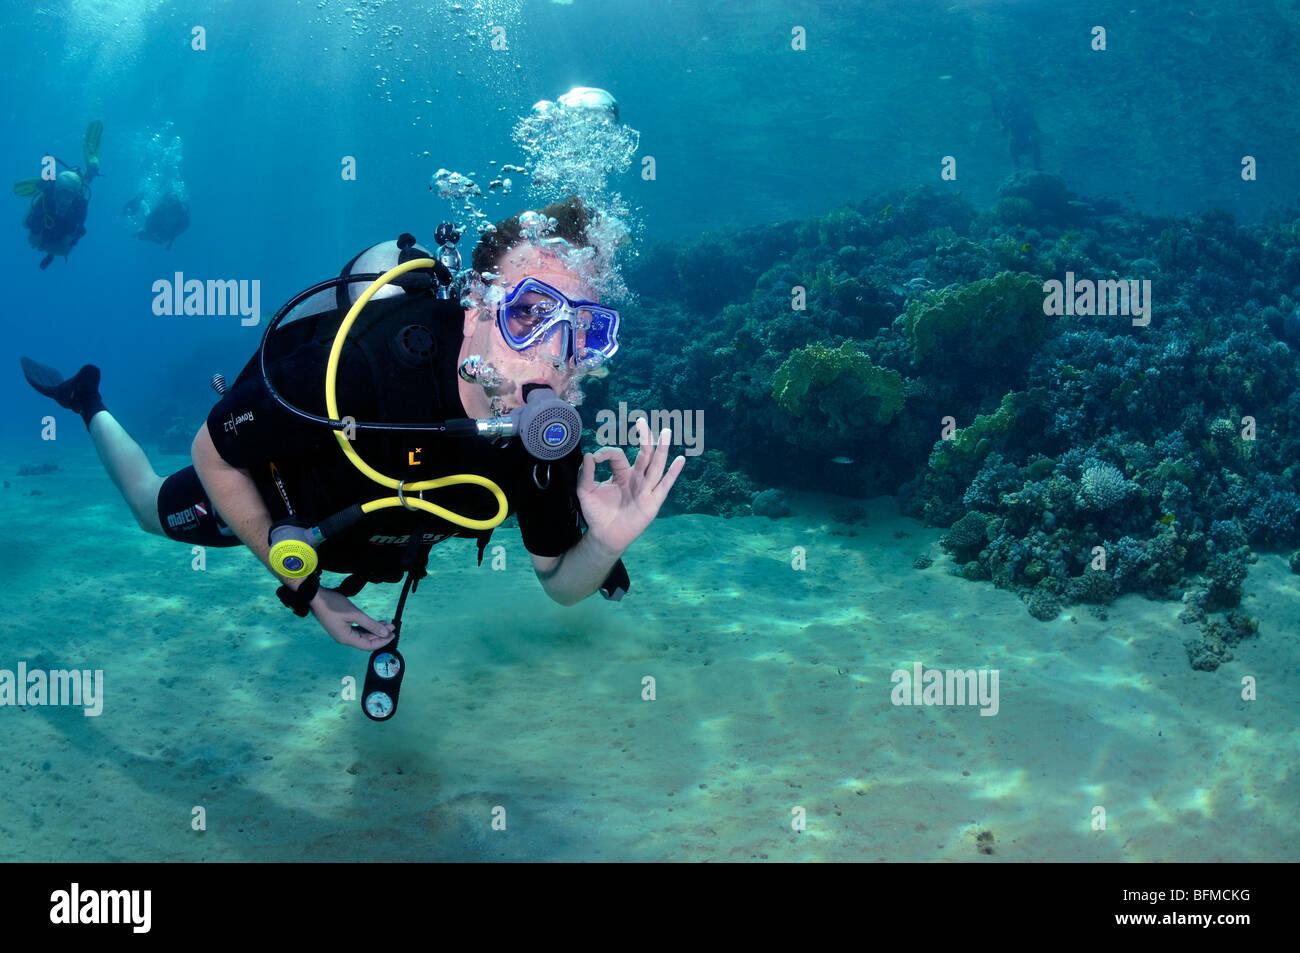 Scuba diver giving OK signal. 'Red Sea' - Stock Image